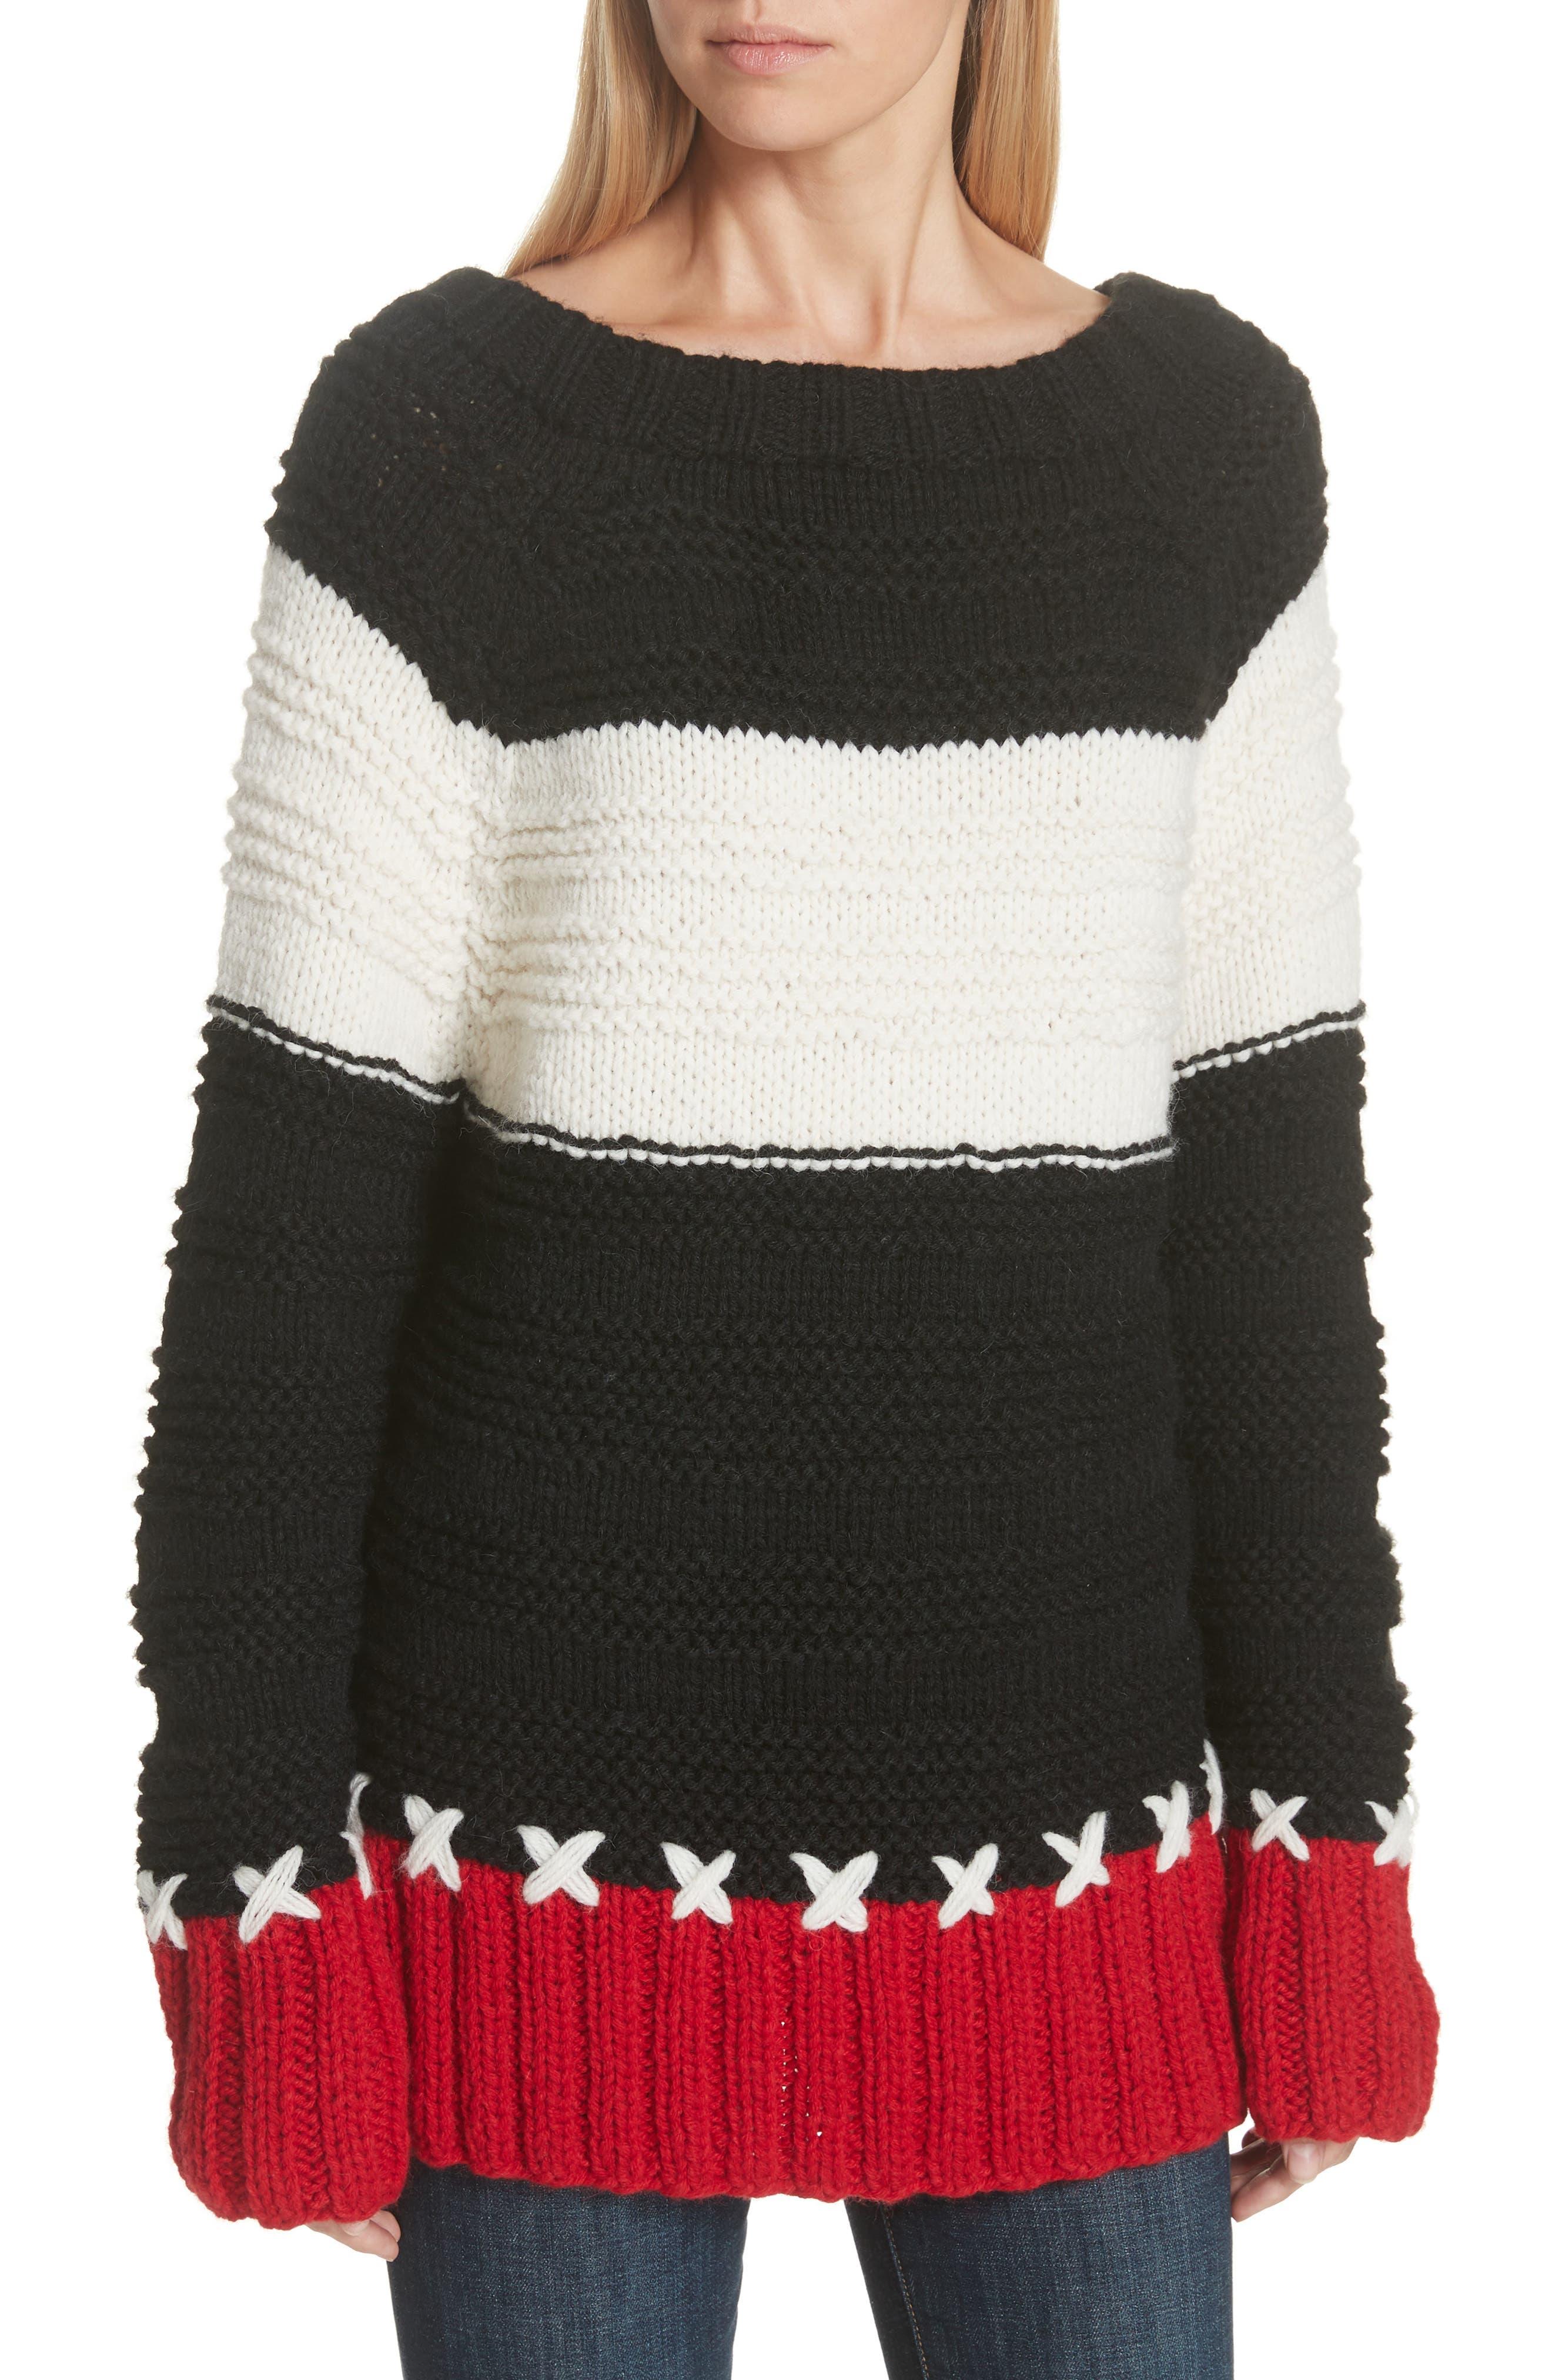 SMYTHE Stripe Cross Stitched Alpaca Blend Sweater, Main, color, 001